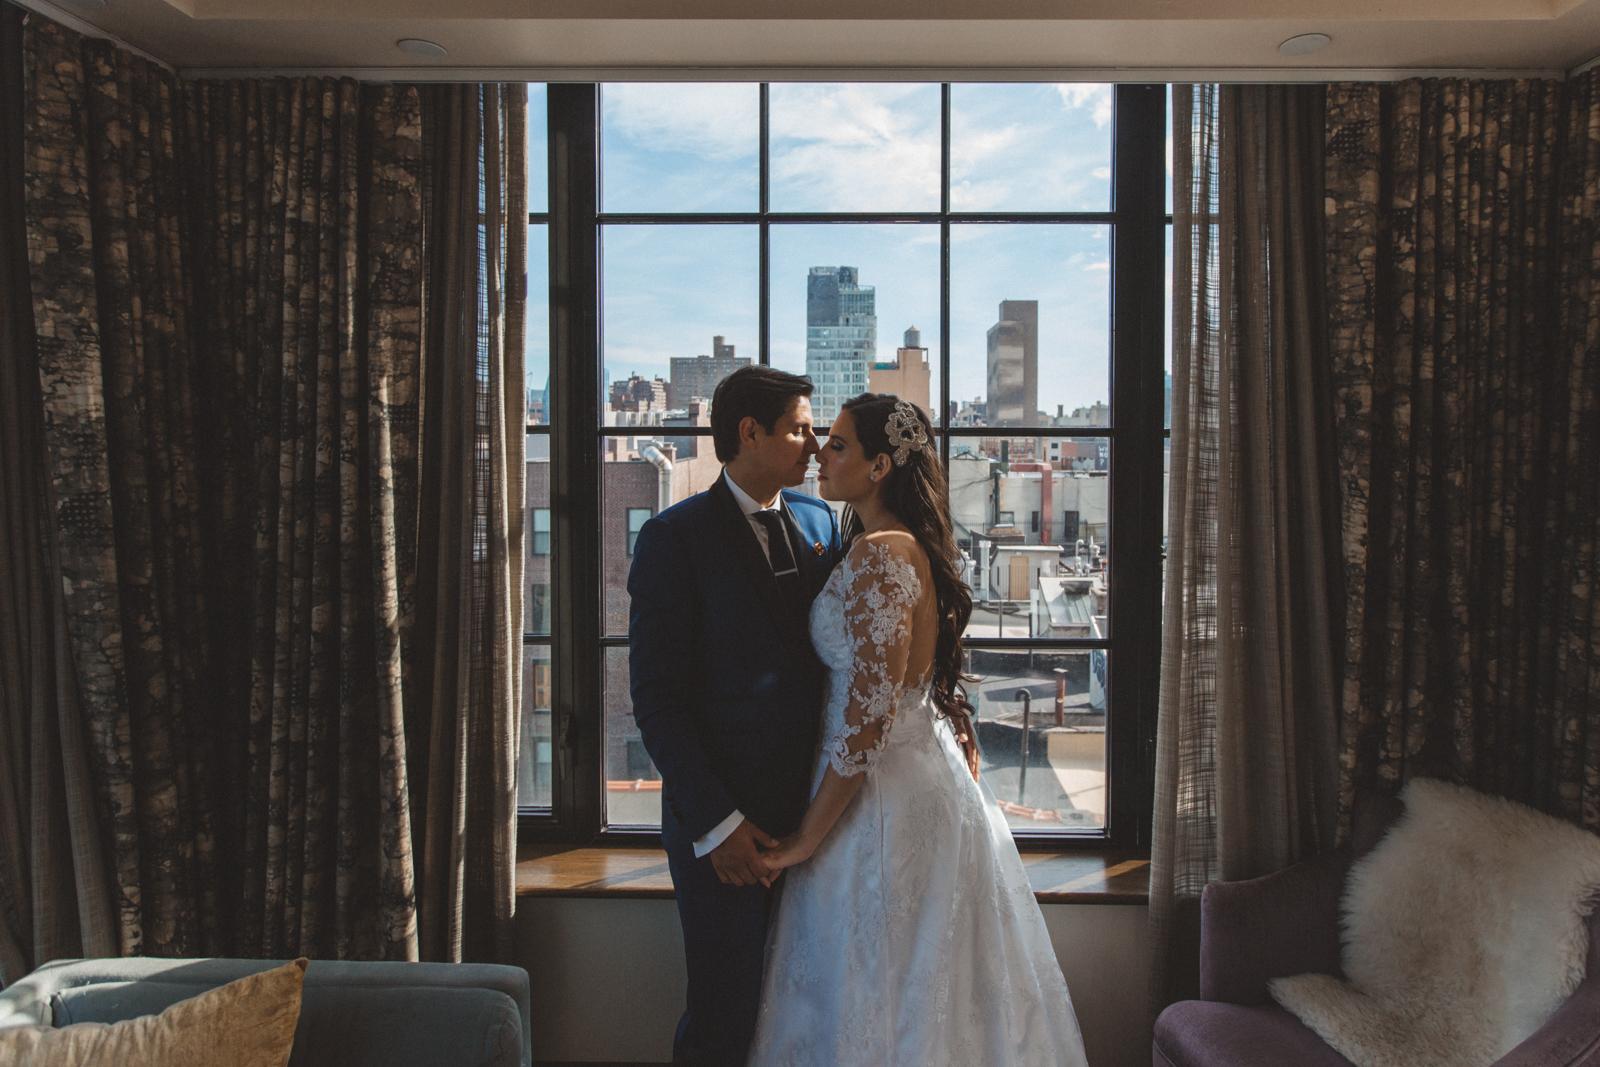 NYC Wedding Photography Lofts at Prince Brooklyn NYC Photographer Boris Zaretsky _B2C5359.jpg